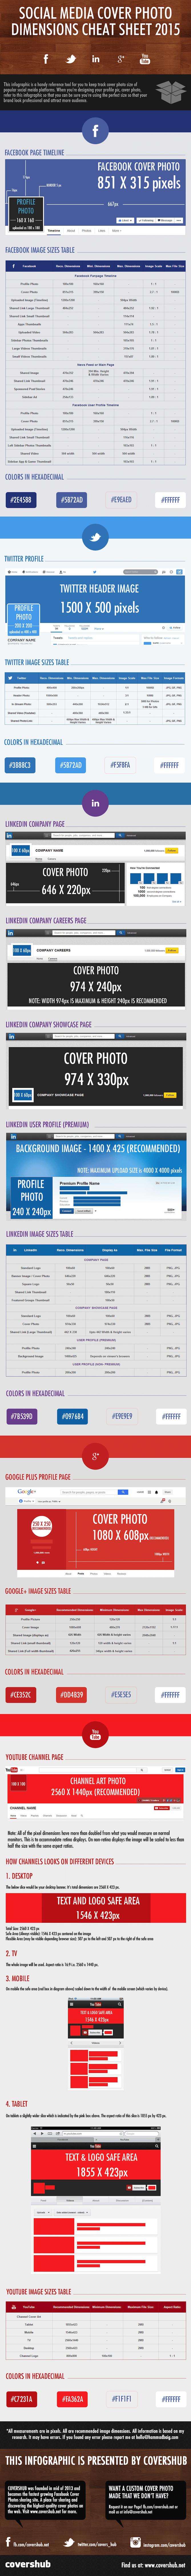 Social-media-cover-photo-dimensions